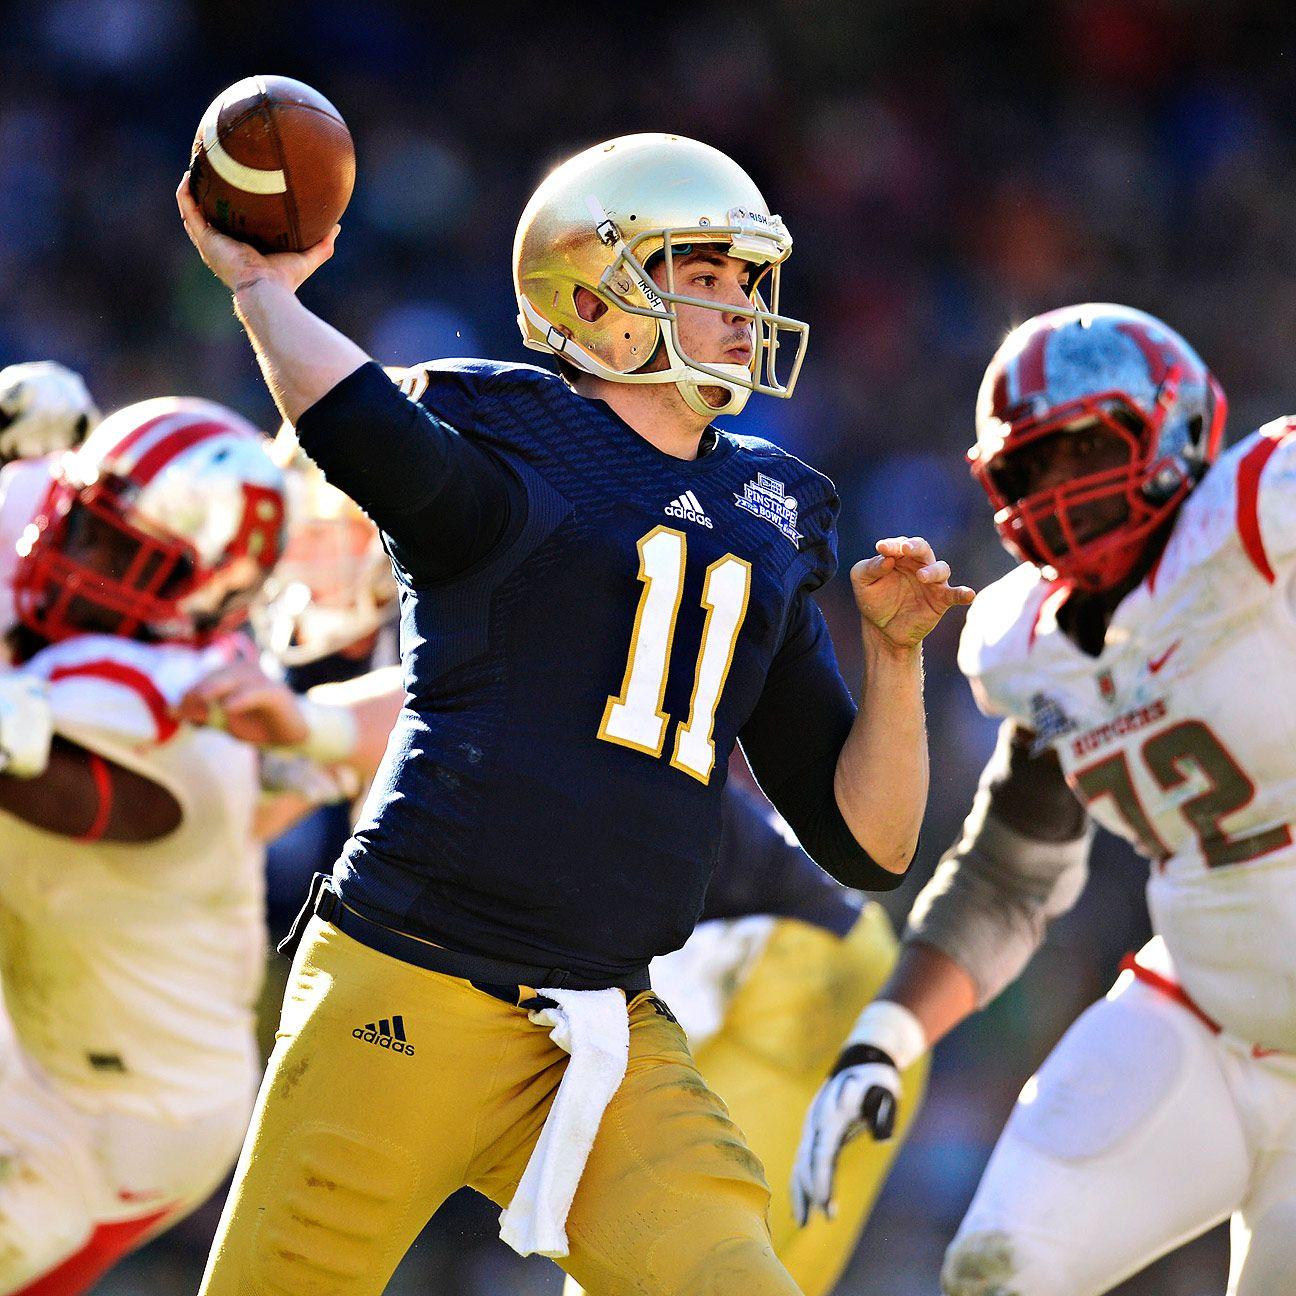 d1 college football teams espn college football bowls